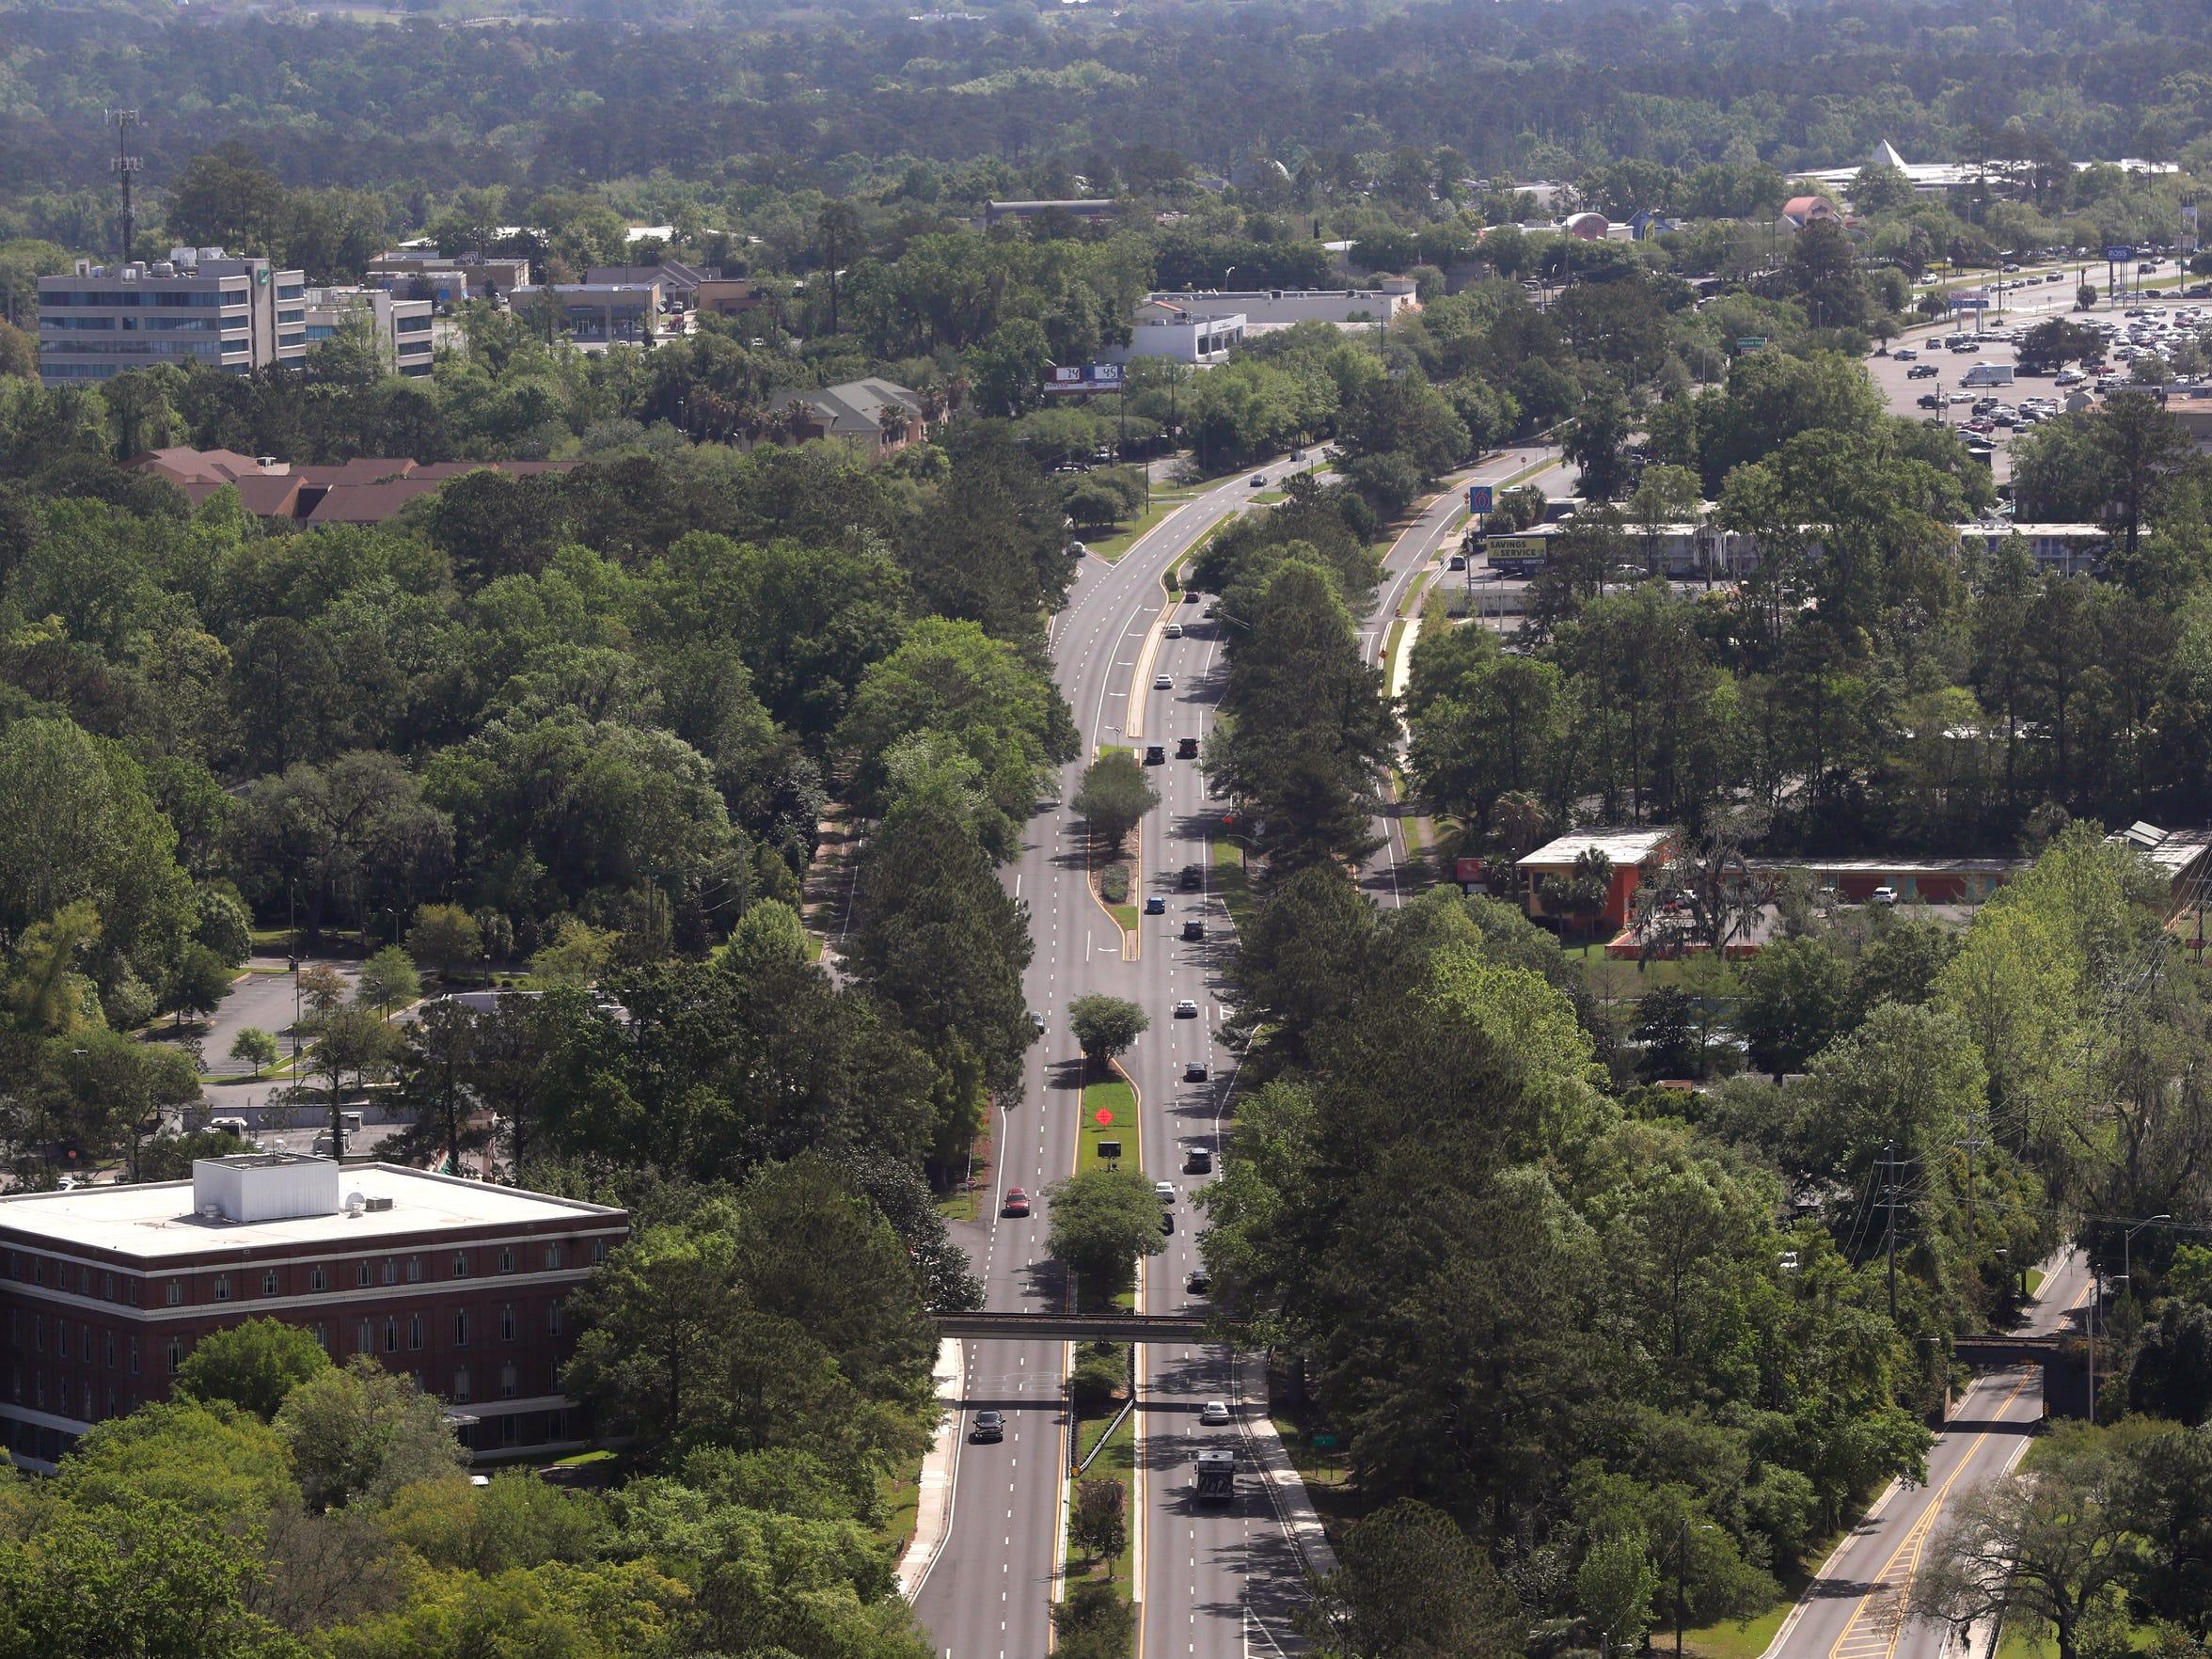 The sylvan view looking East down Apalachee Parkway